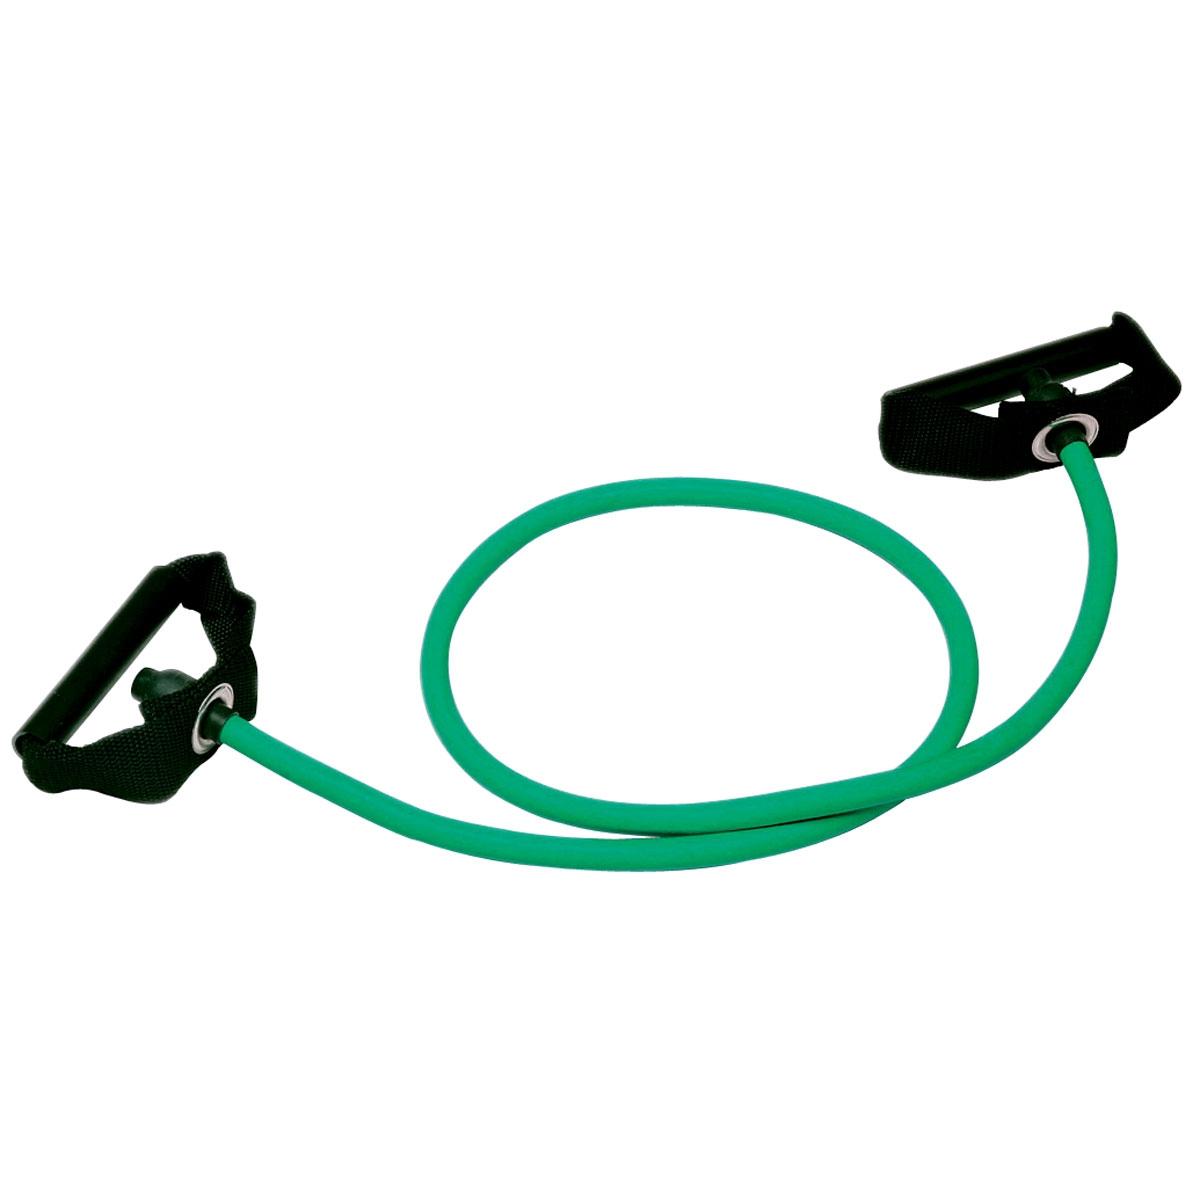 green xertube exercise resistance band